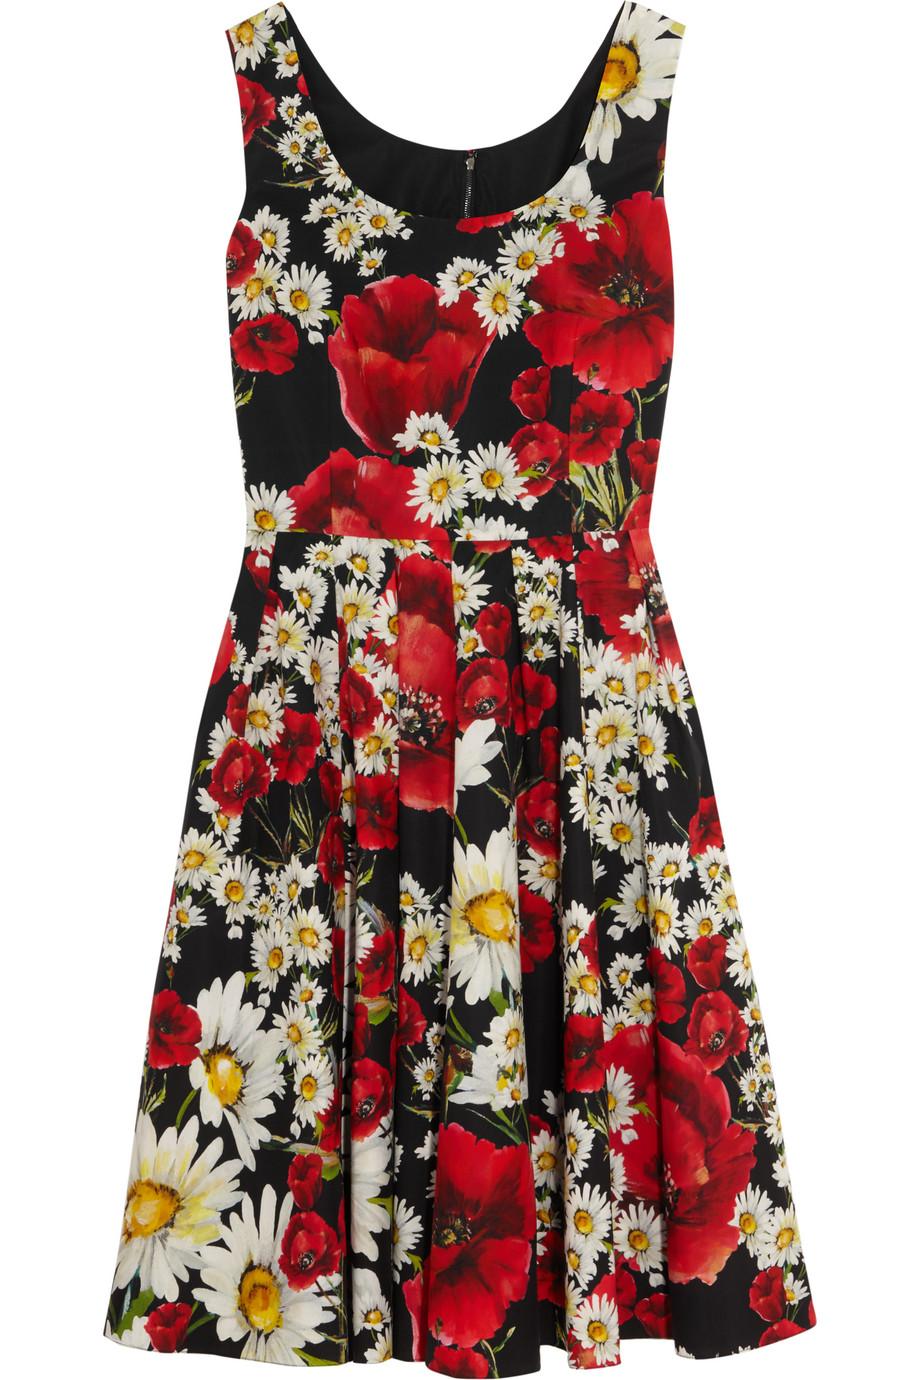 Dolce & Gabbana Floral-Print Cotton-Poplin Dress, Red/Black, Women's - Printed, Size: 36